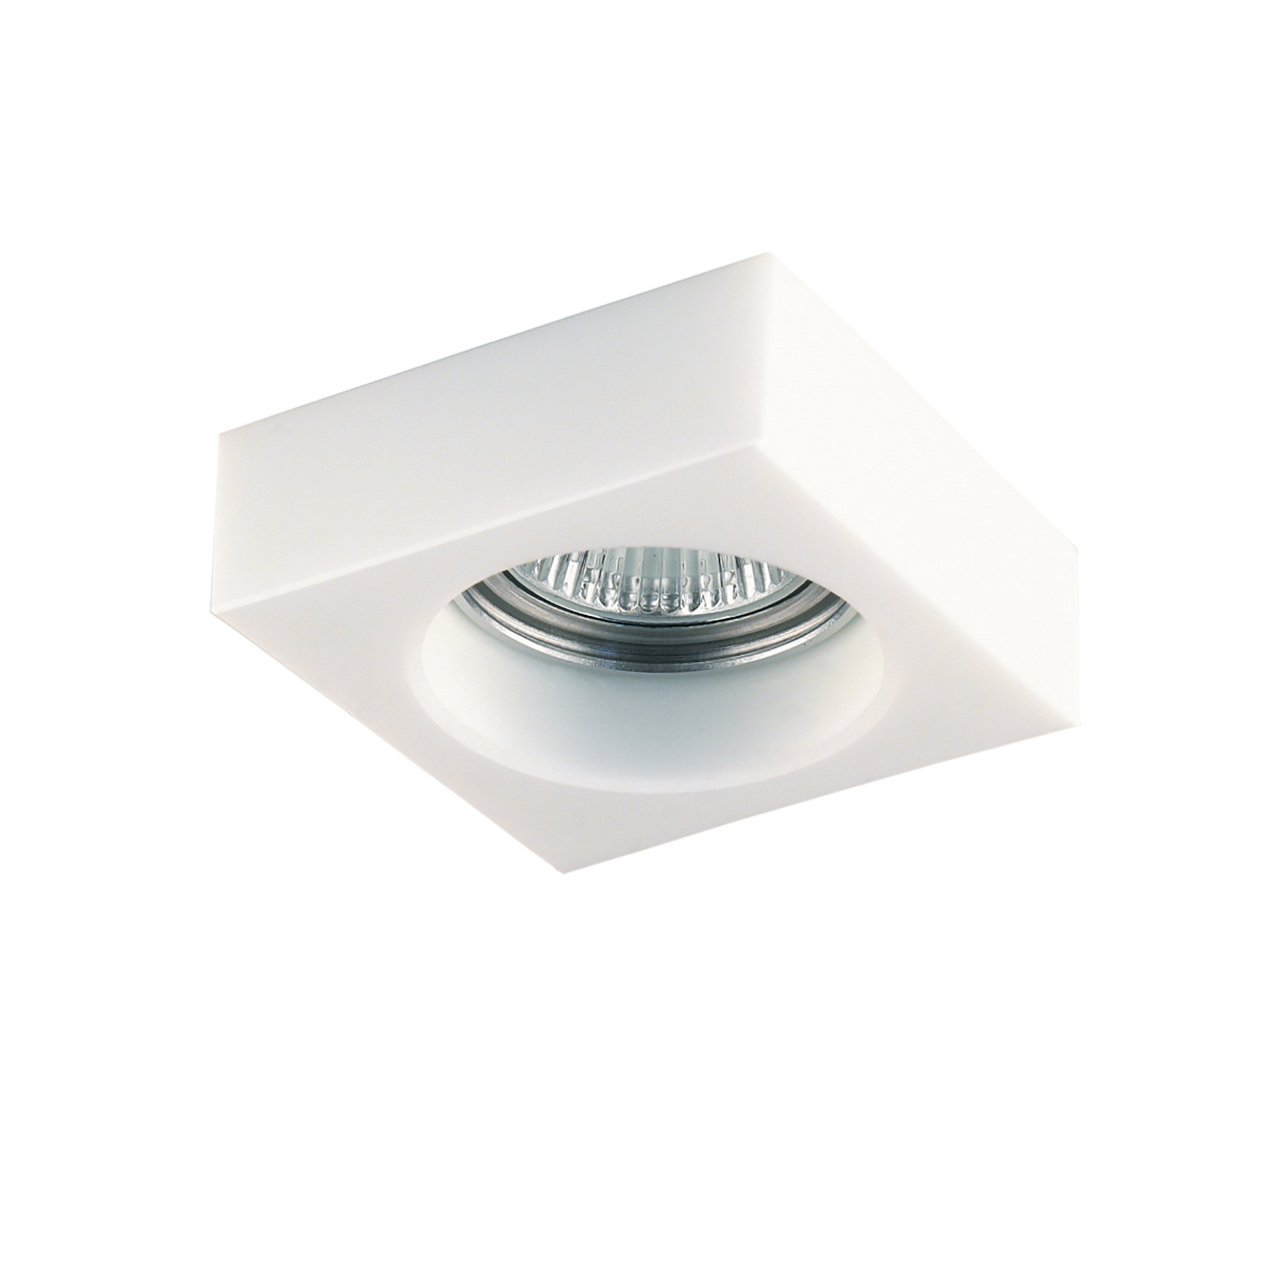 Светильник Lui Mini MR16 / HP16 хром / белый Lightstar 006146